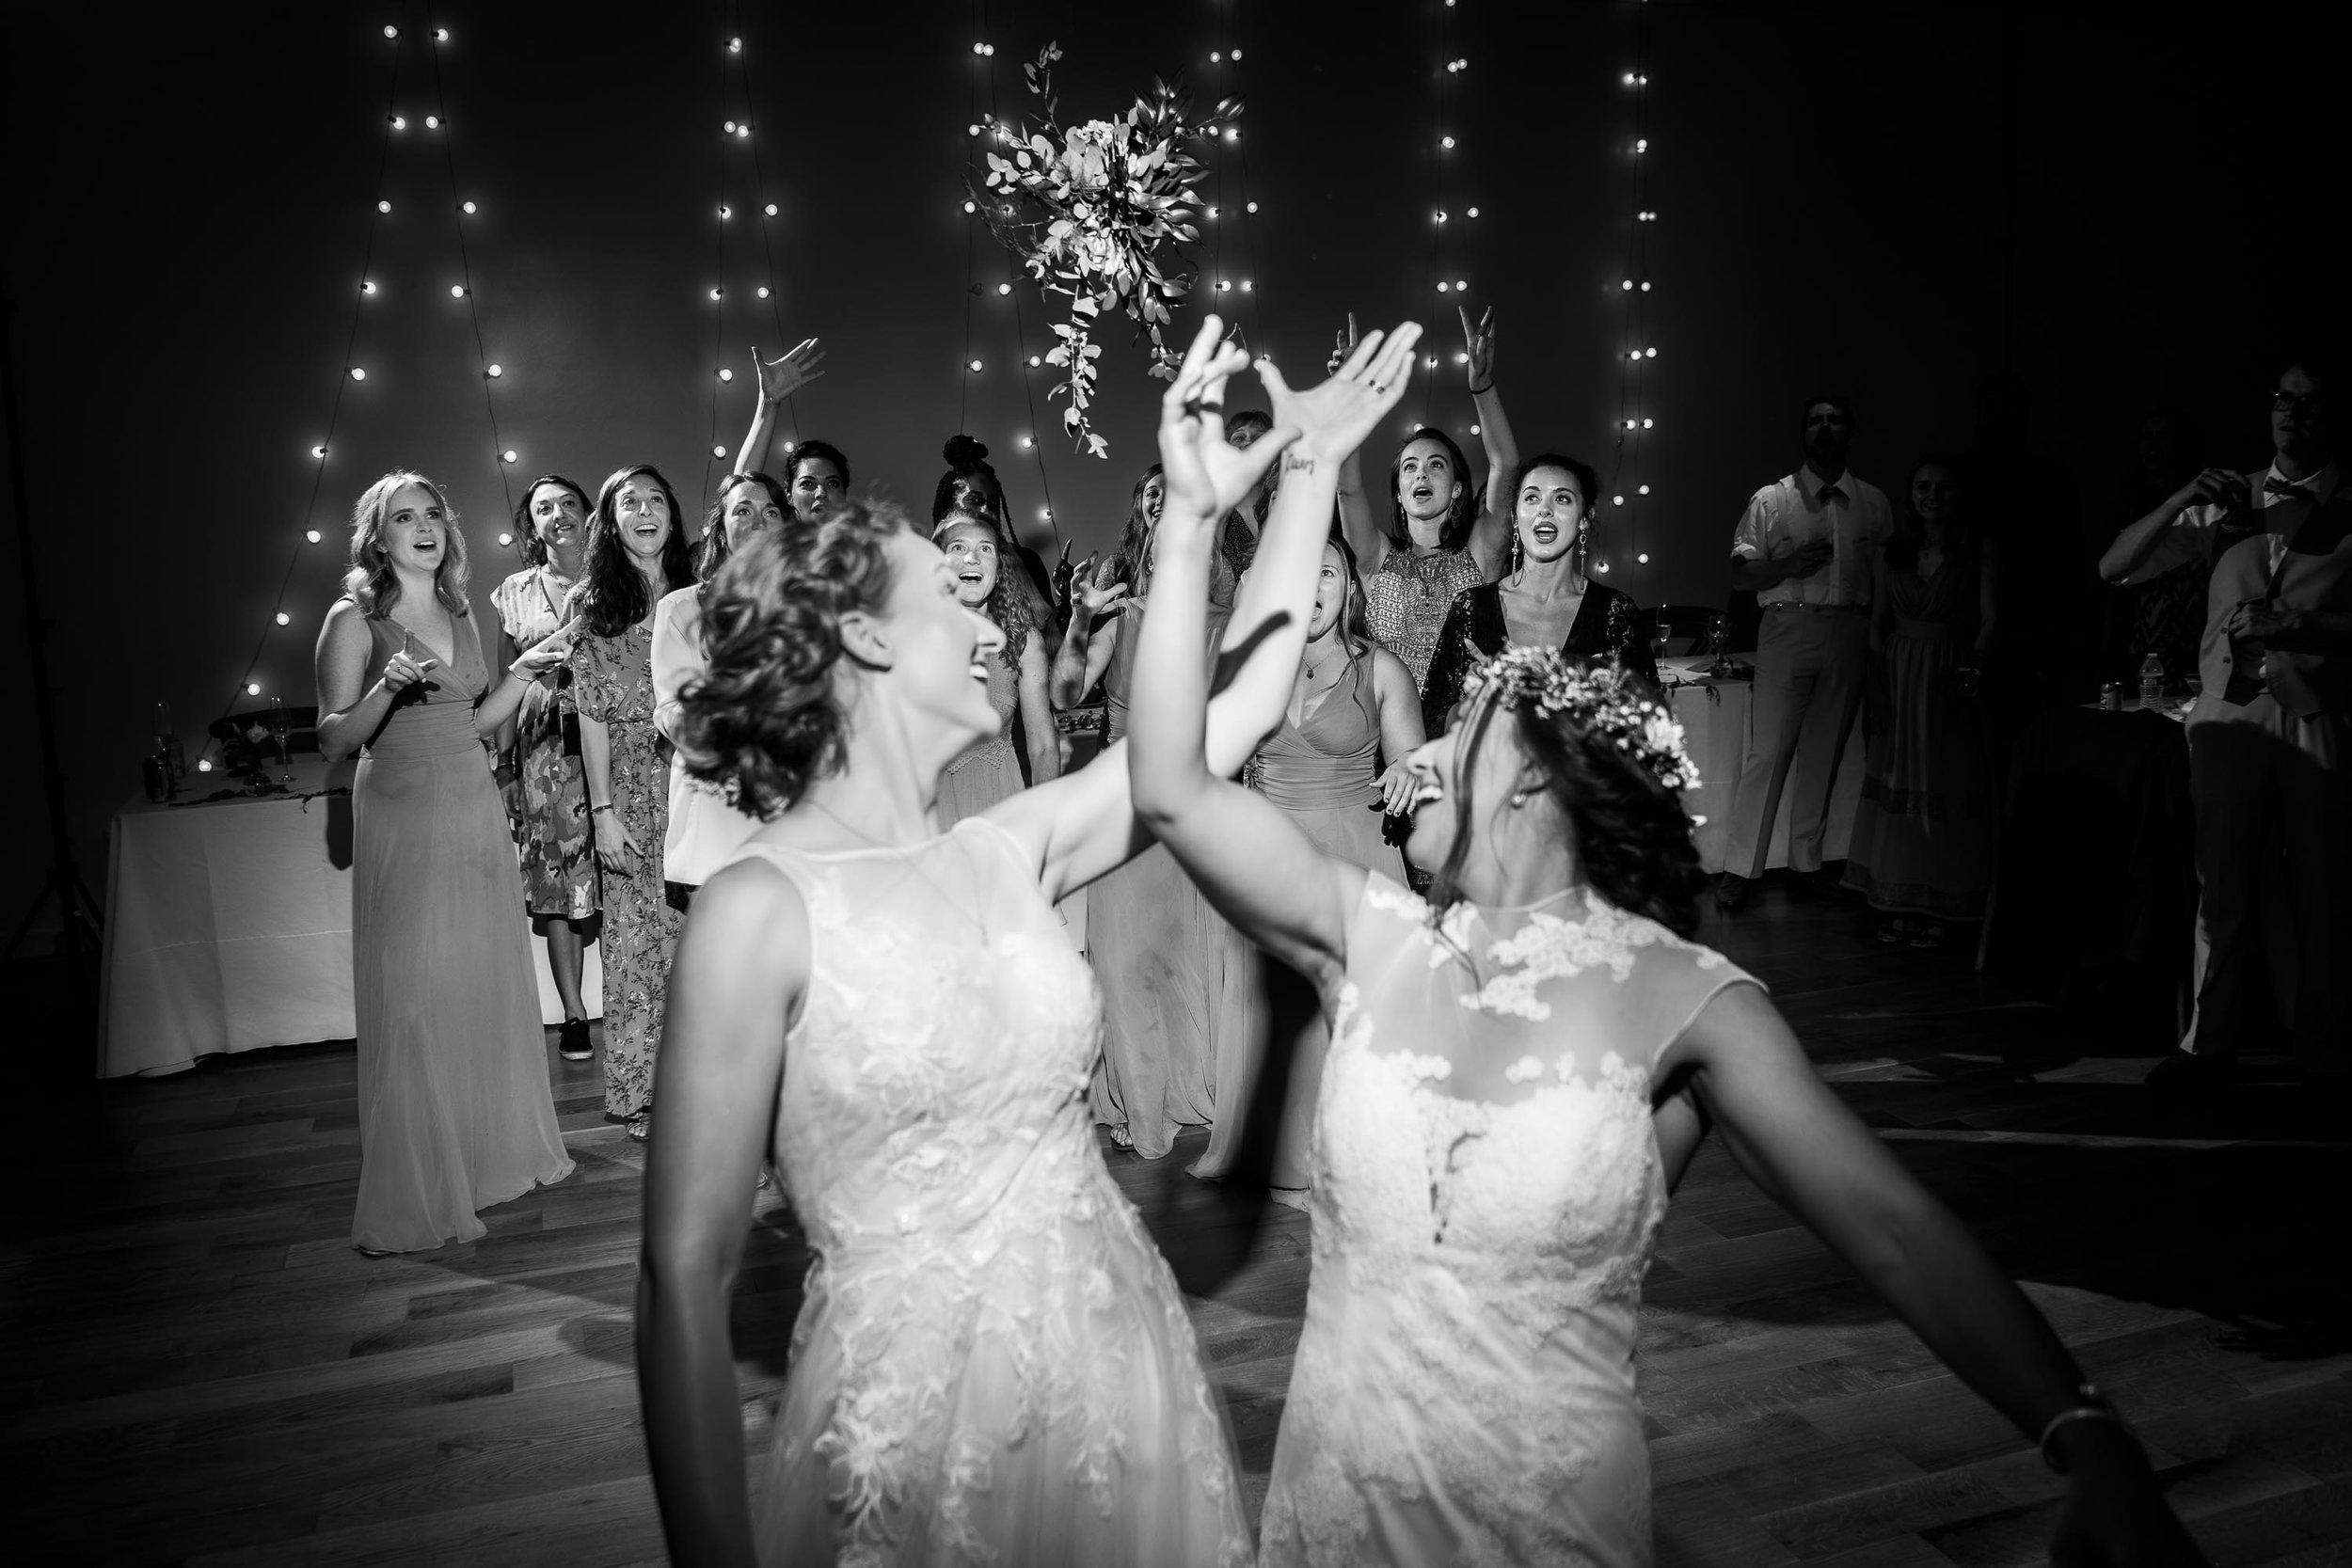 Rist_Canyon_Inn_Laporte_Wedding-181.jpg